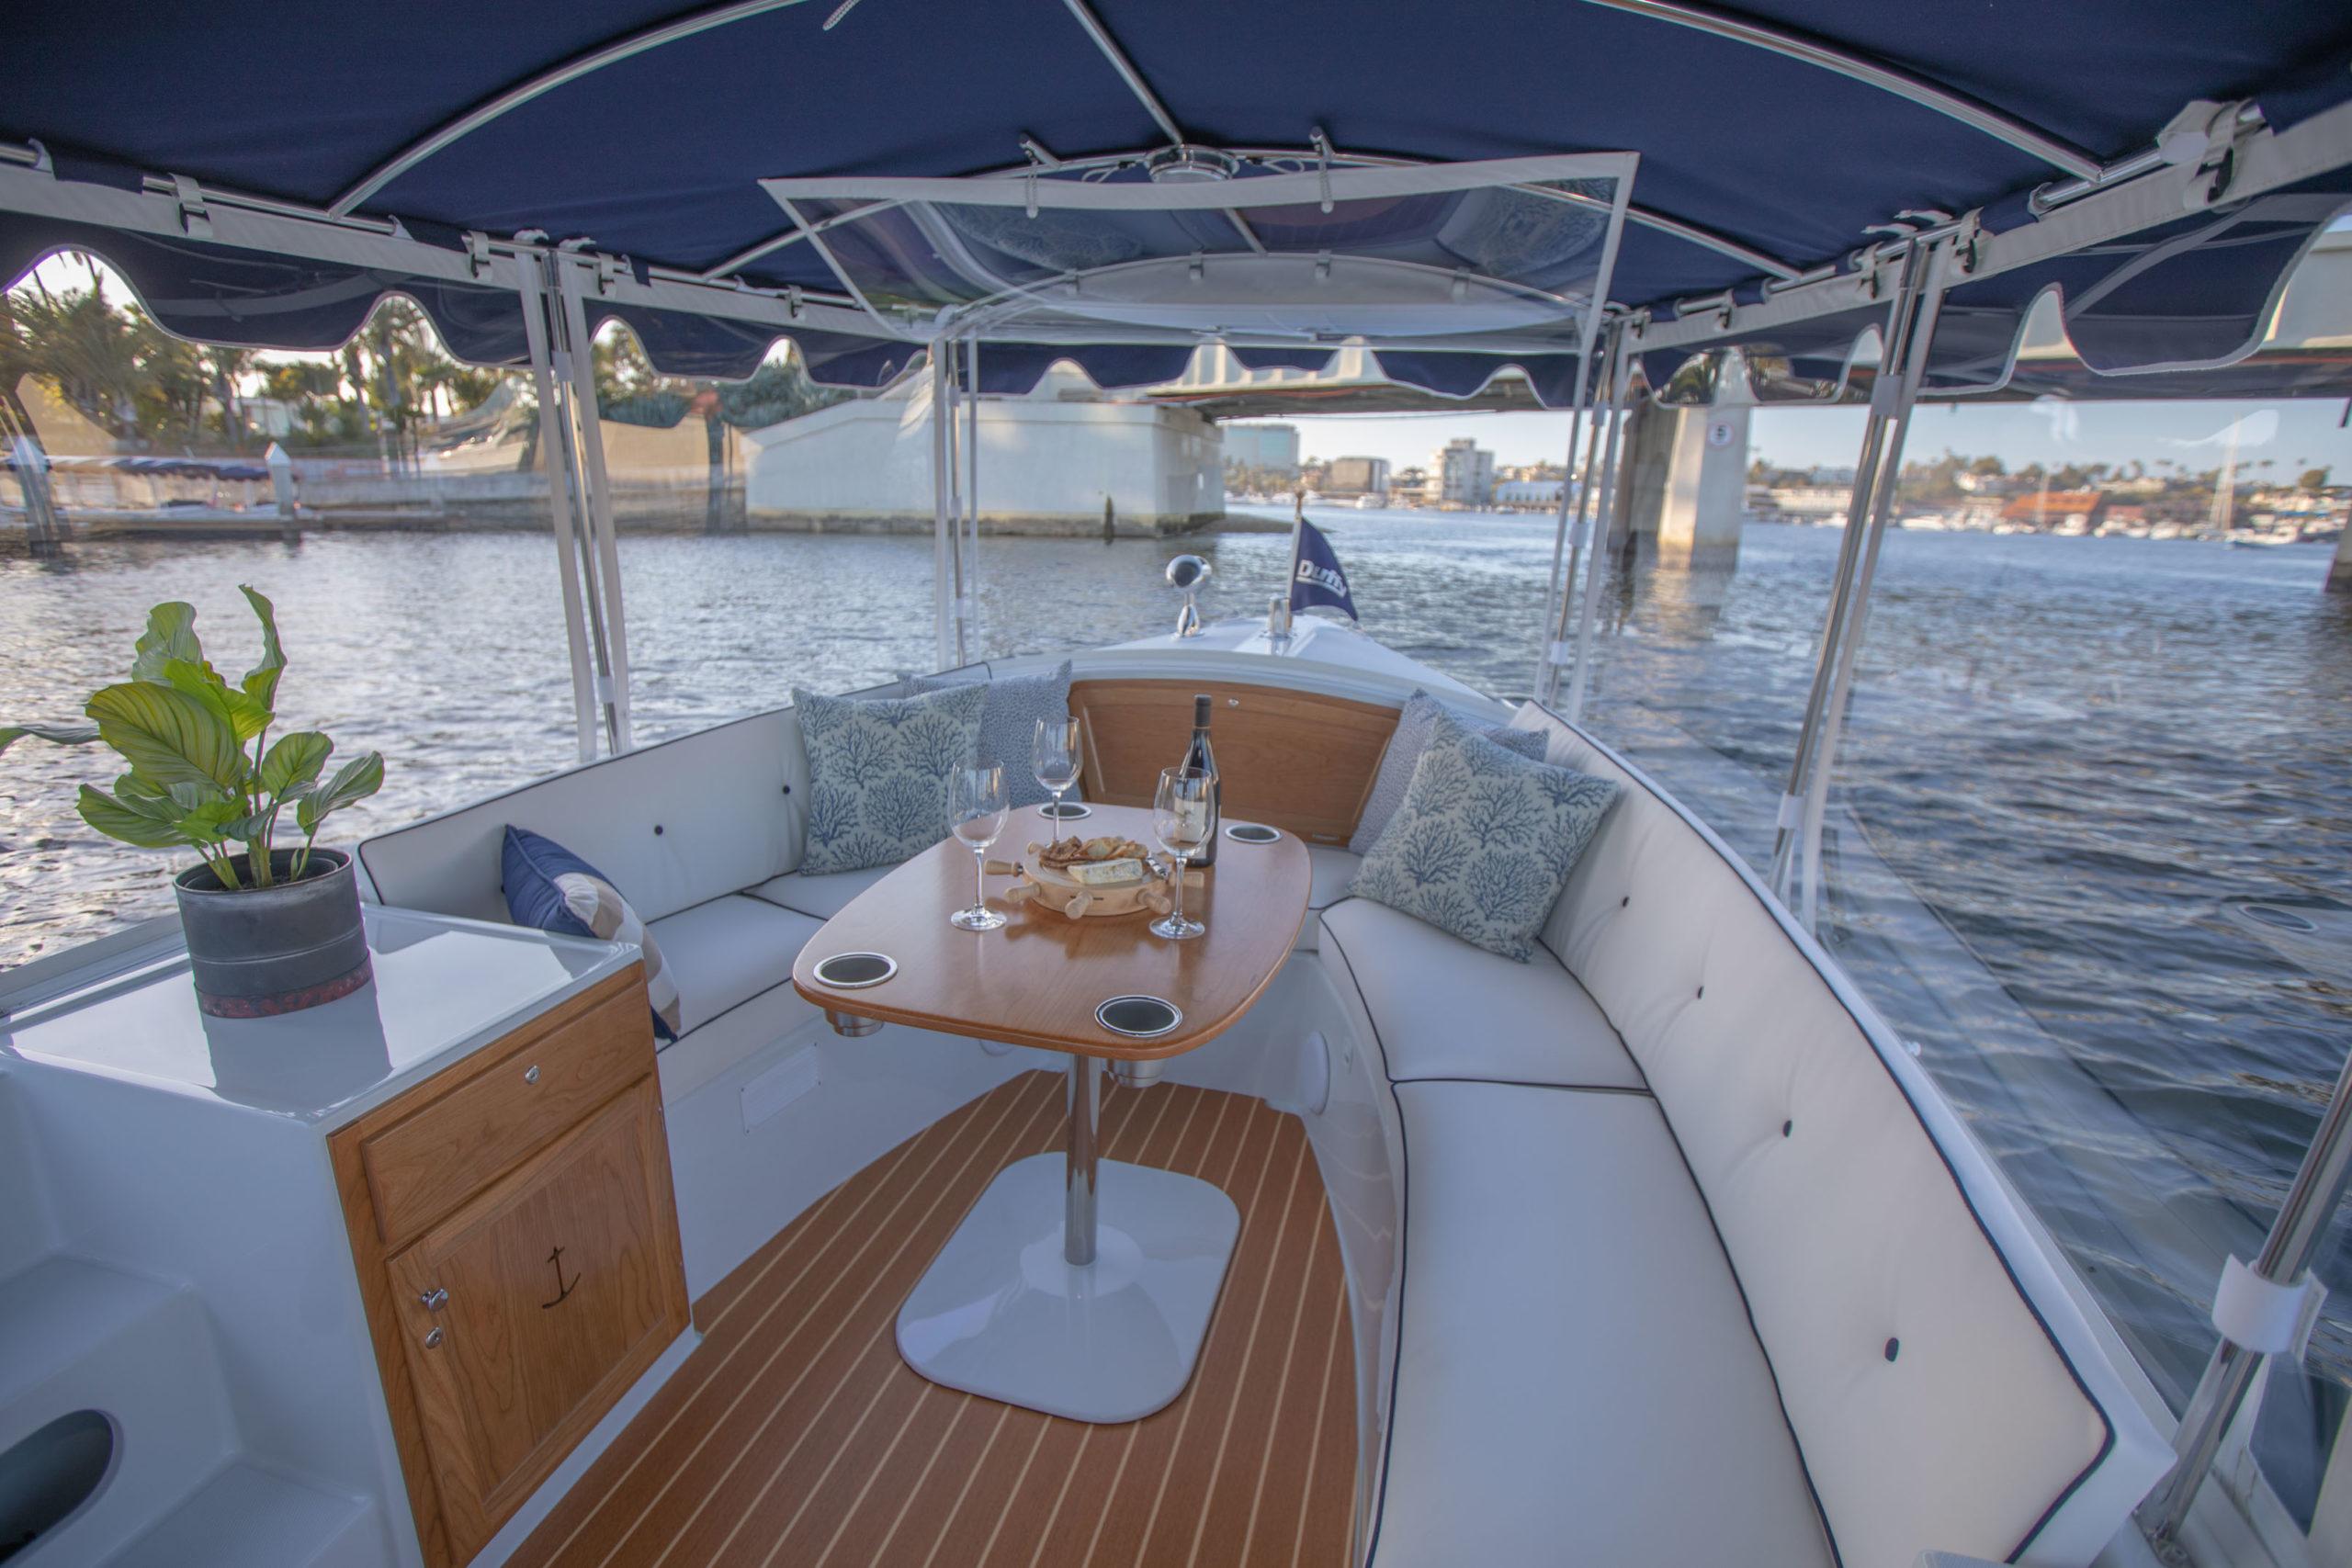 Duffy-Electric-Boats-18-Snug-Harbor-Interior-2020-18